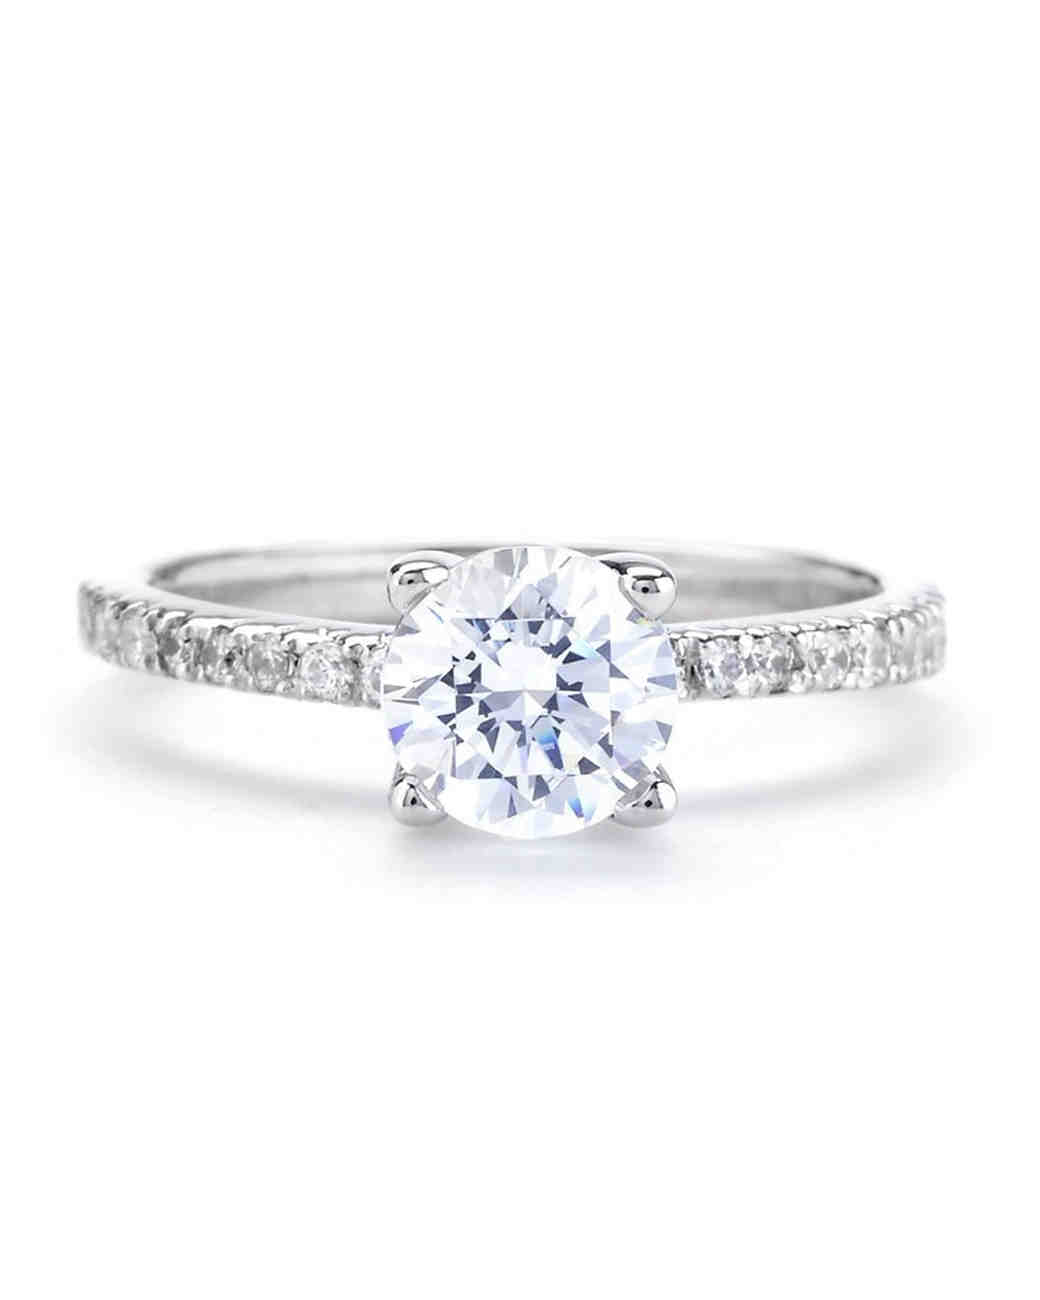 Mark Schneider White Gold Engagement Ring